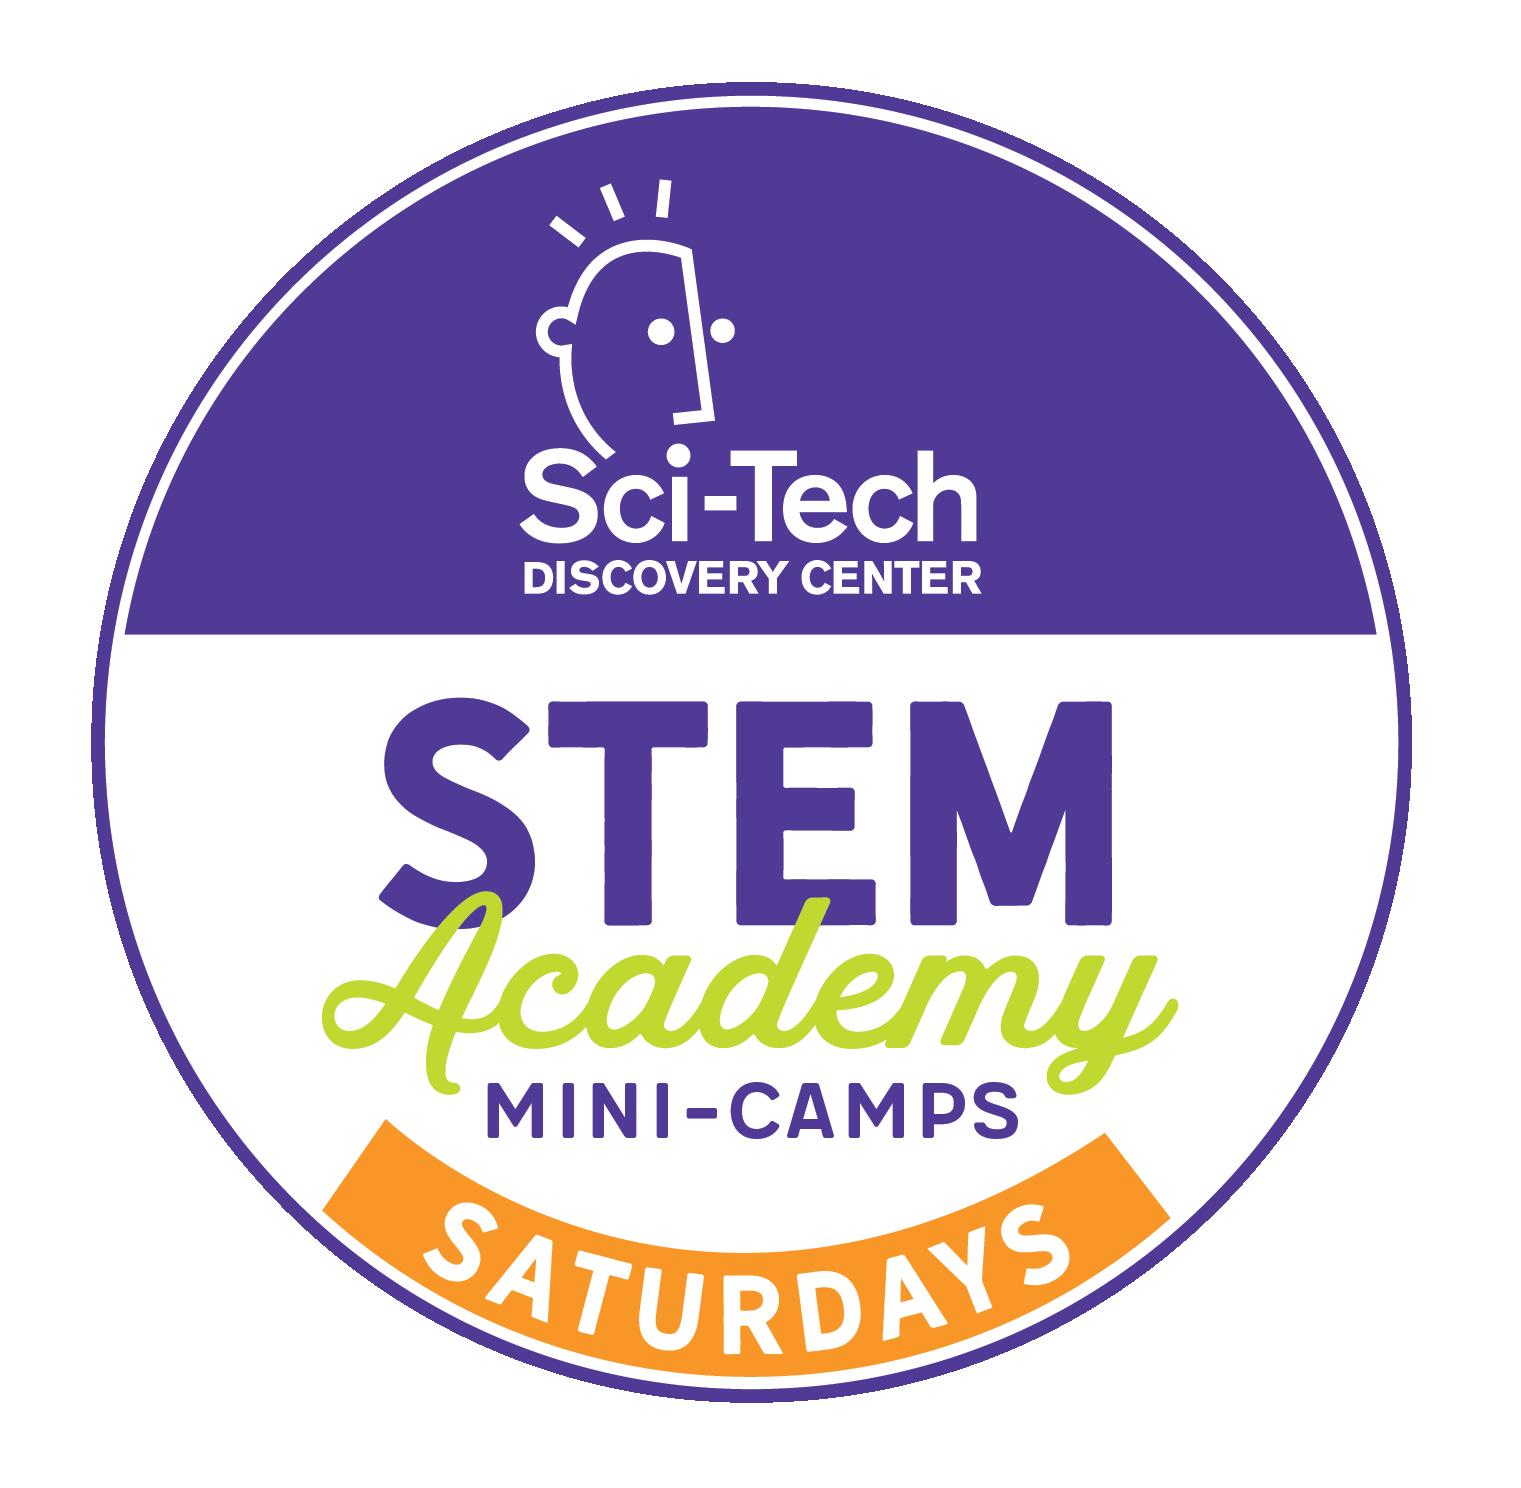 Stem Academy Sci Tech Discovery Center